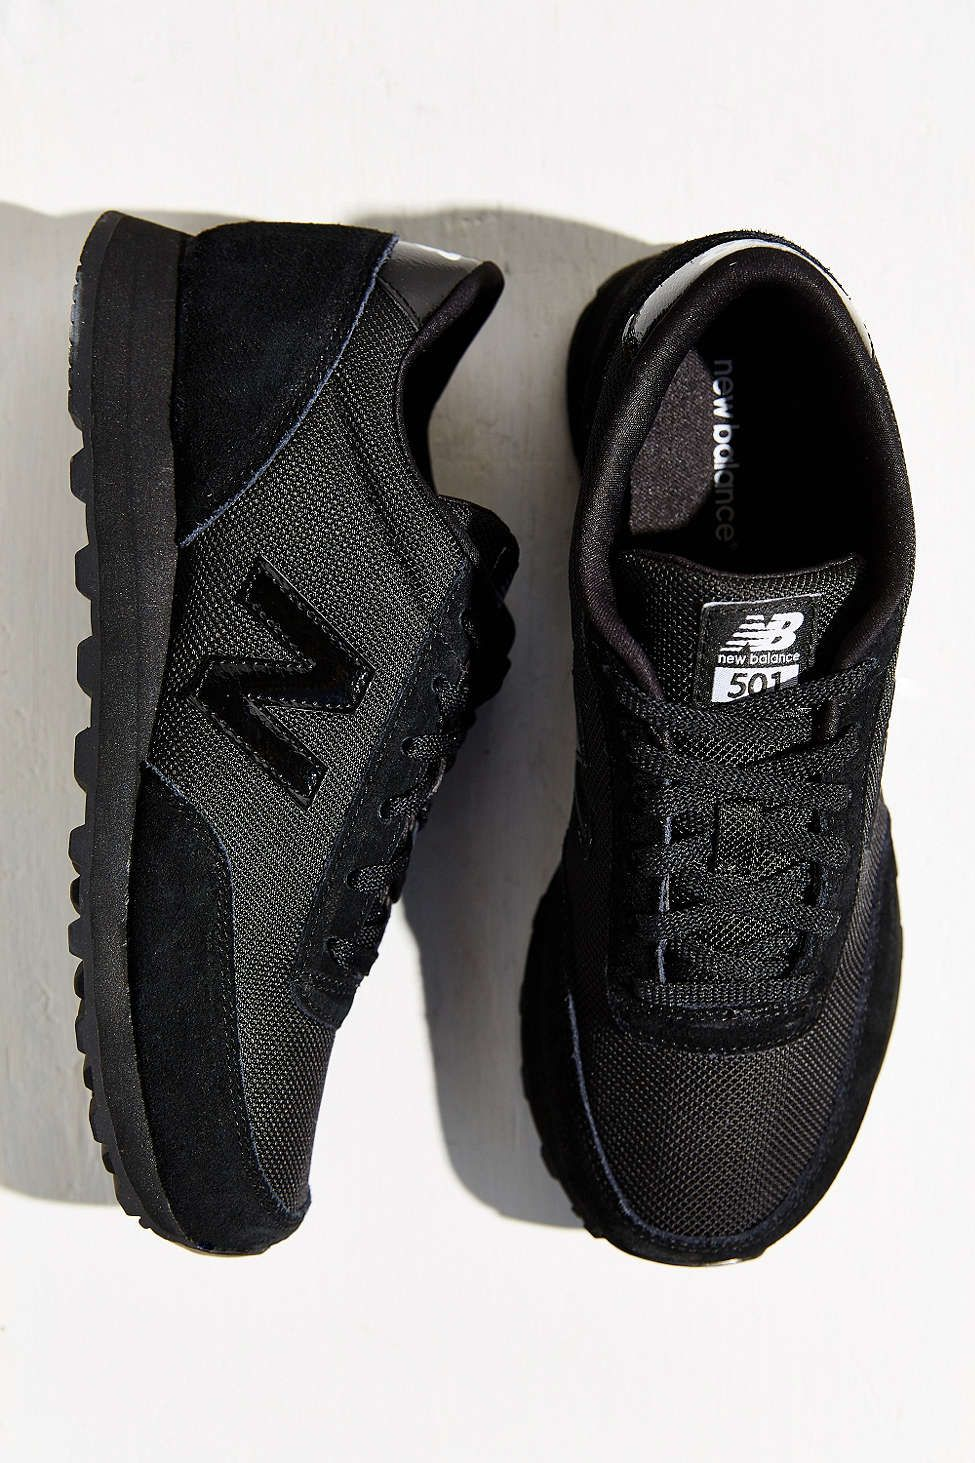 Uo Kicks Black I Balance Running These Want Sneaker 501 X New wtvqaE